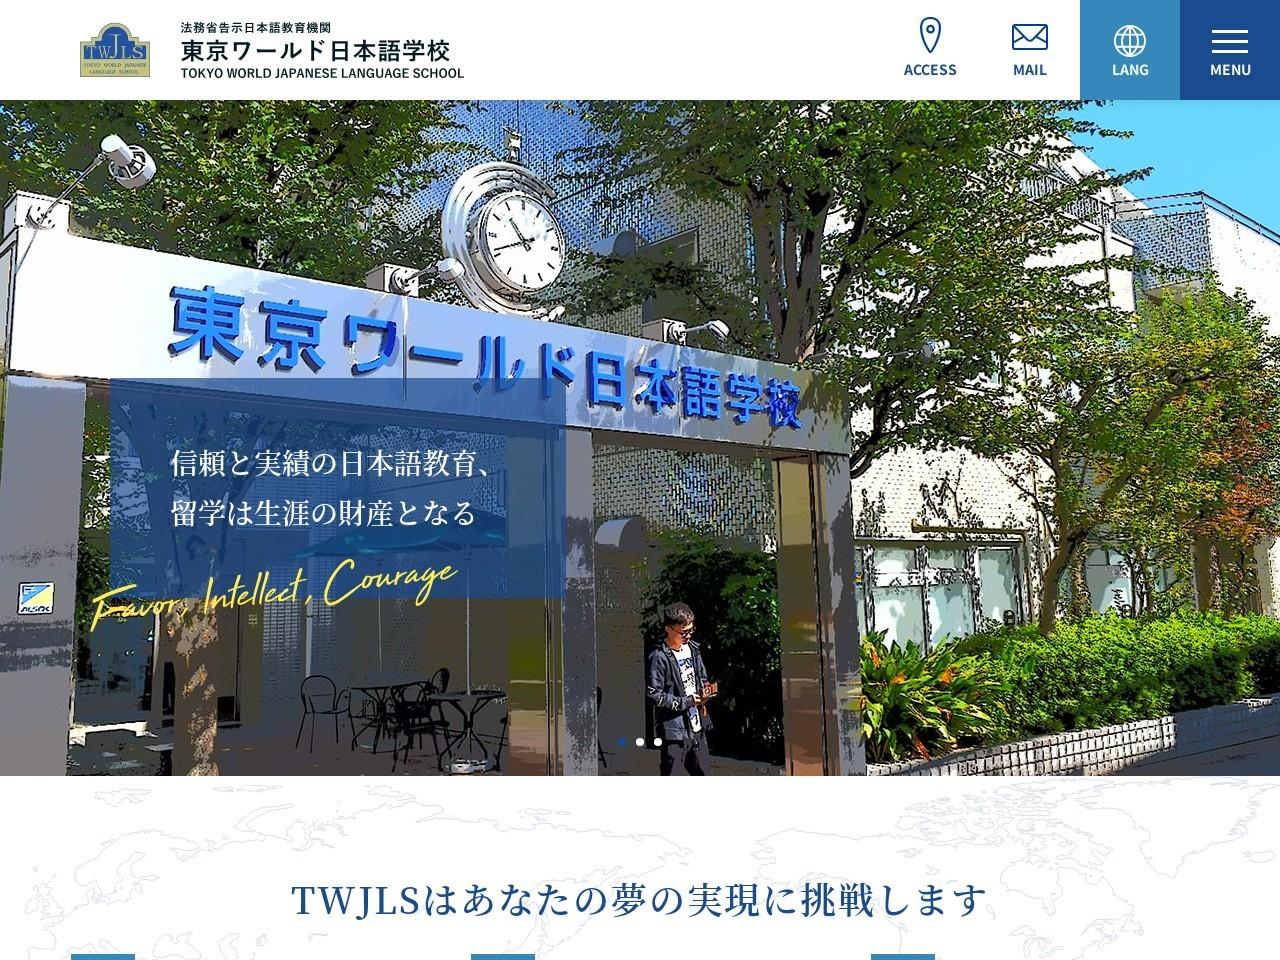 東京ワールド日本語学校